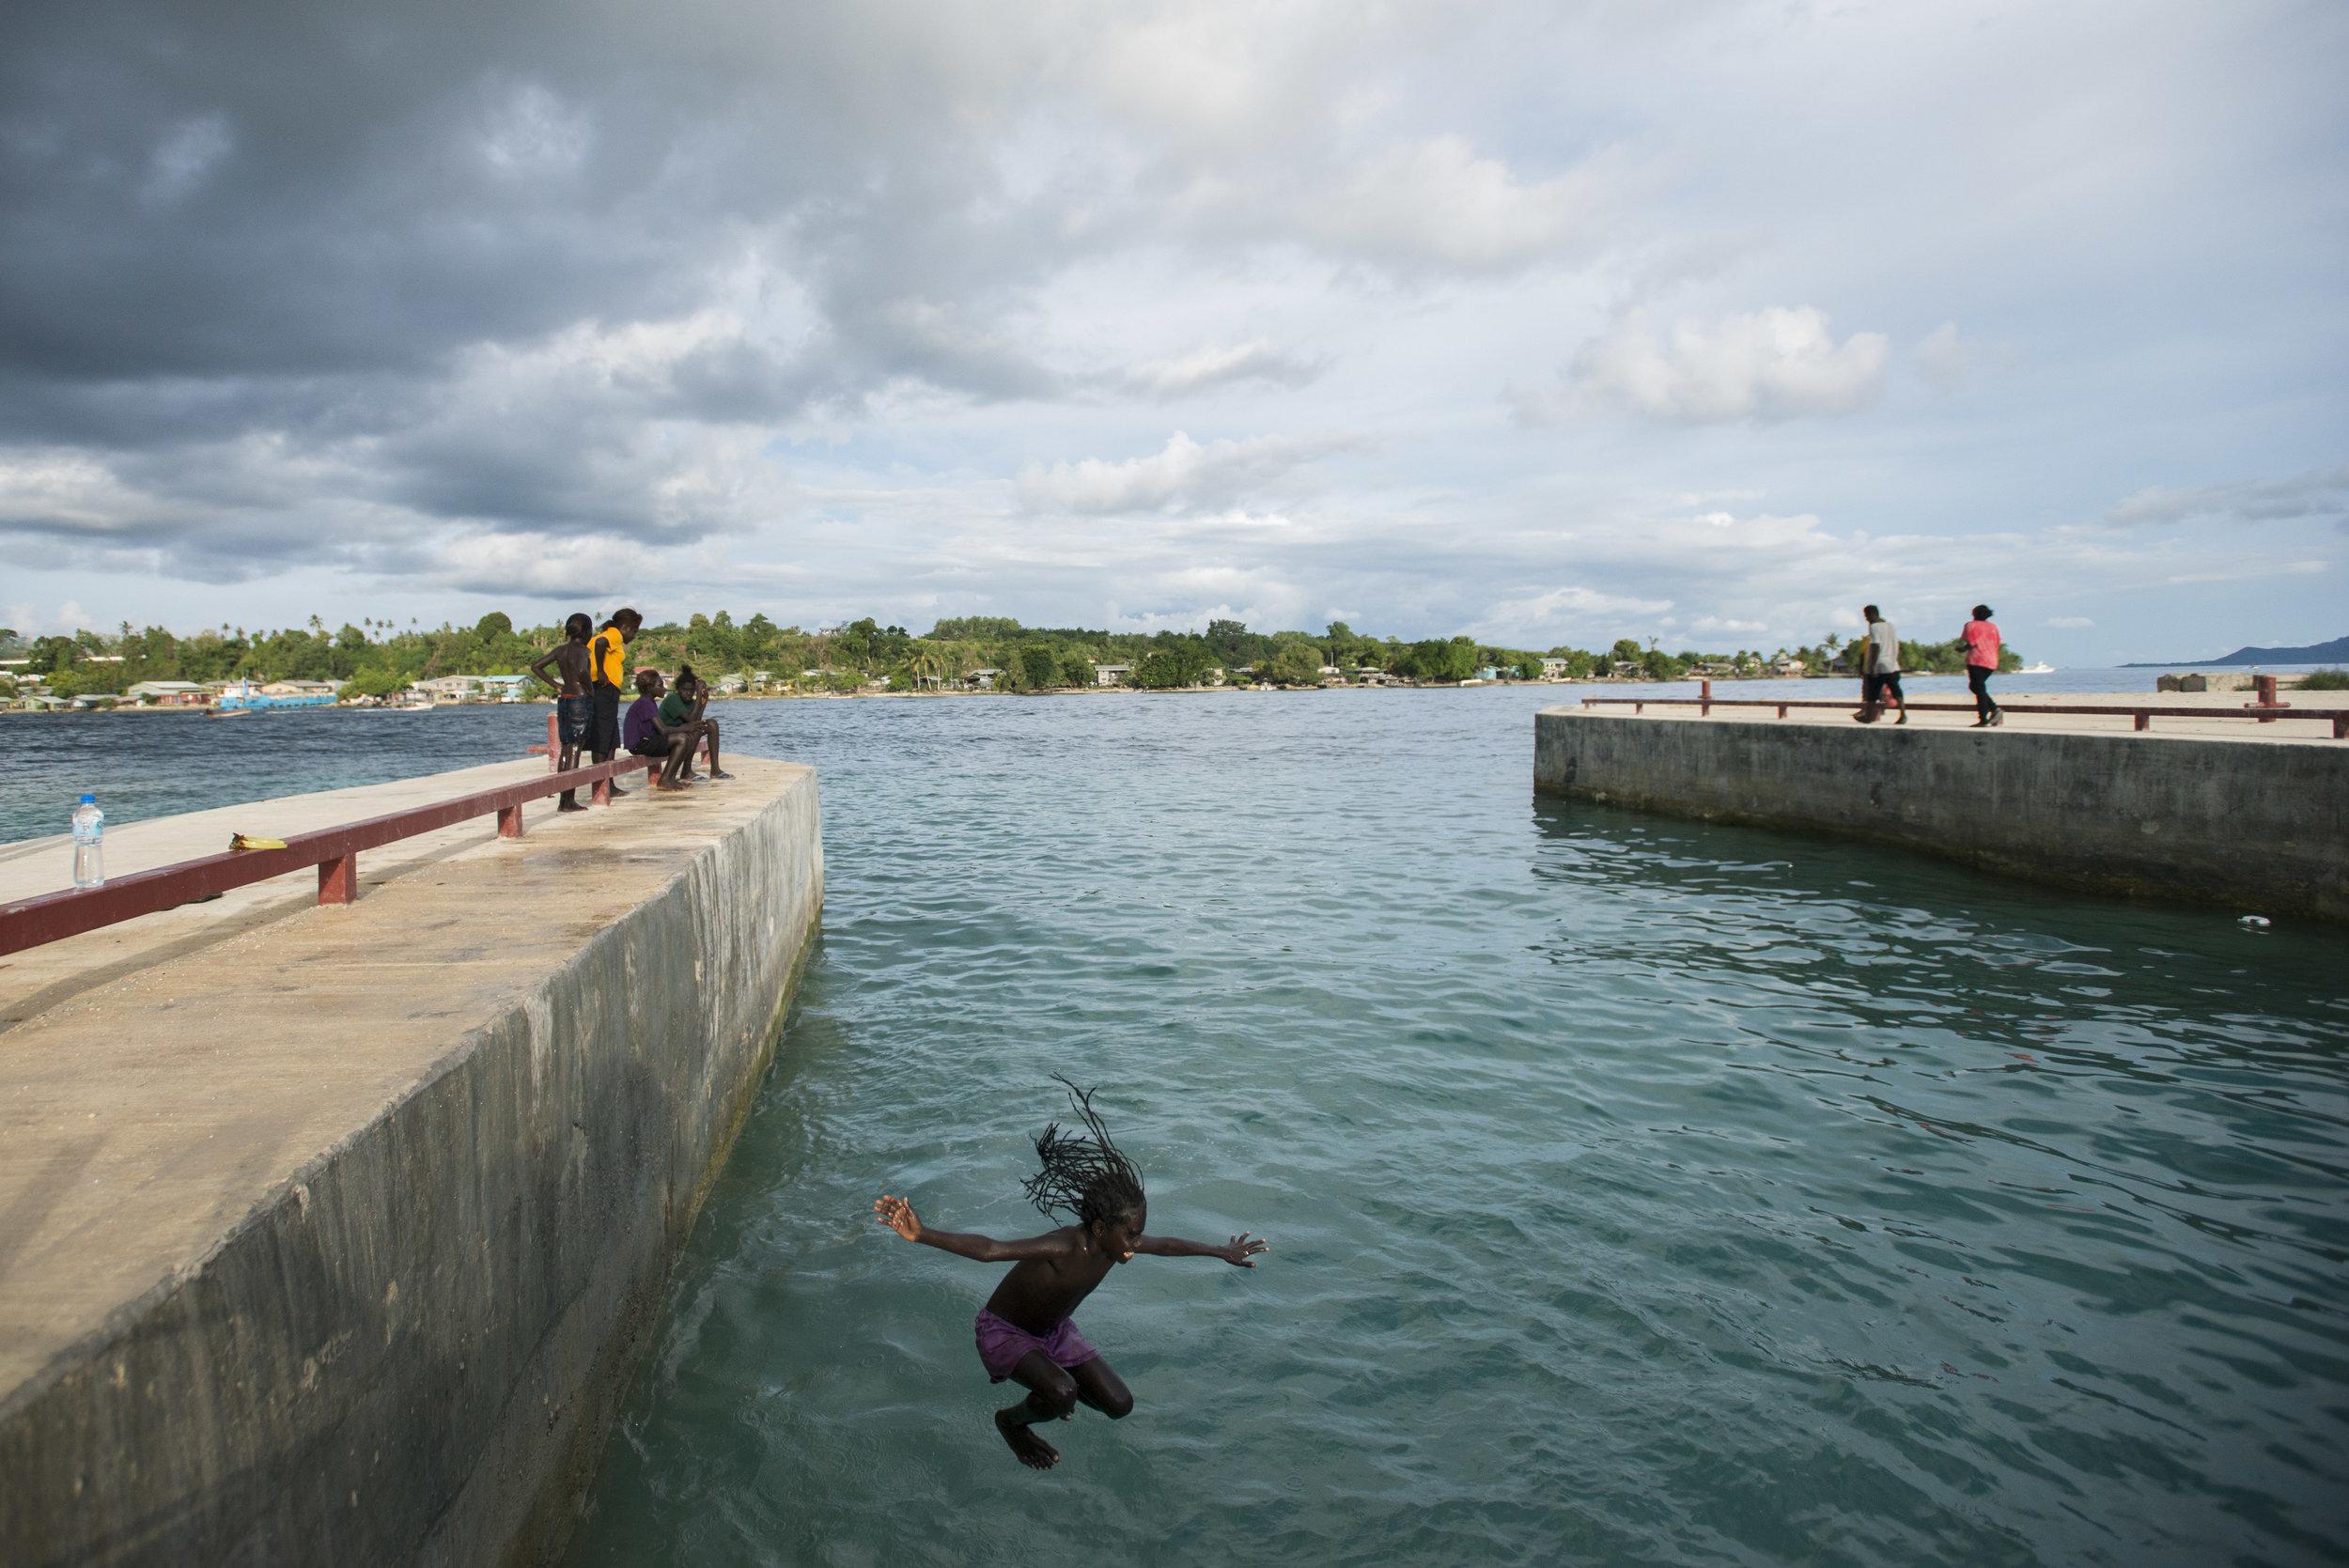 Buka. Bougainville, PNG. 2018.